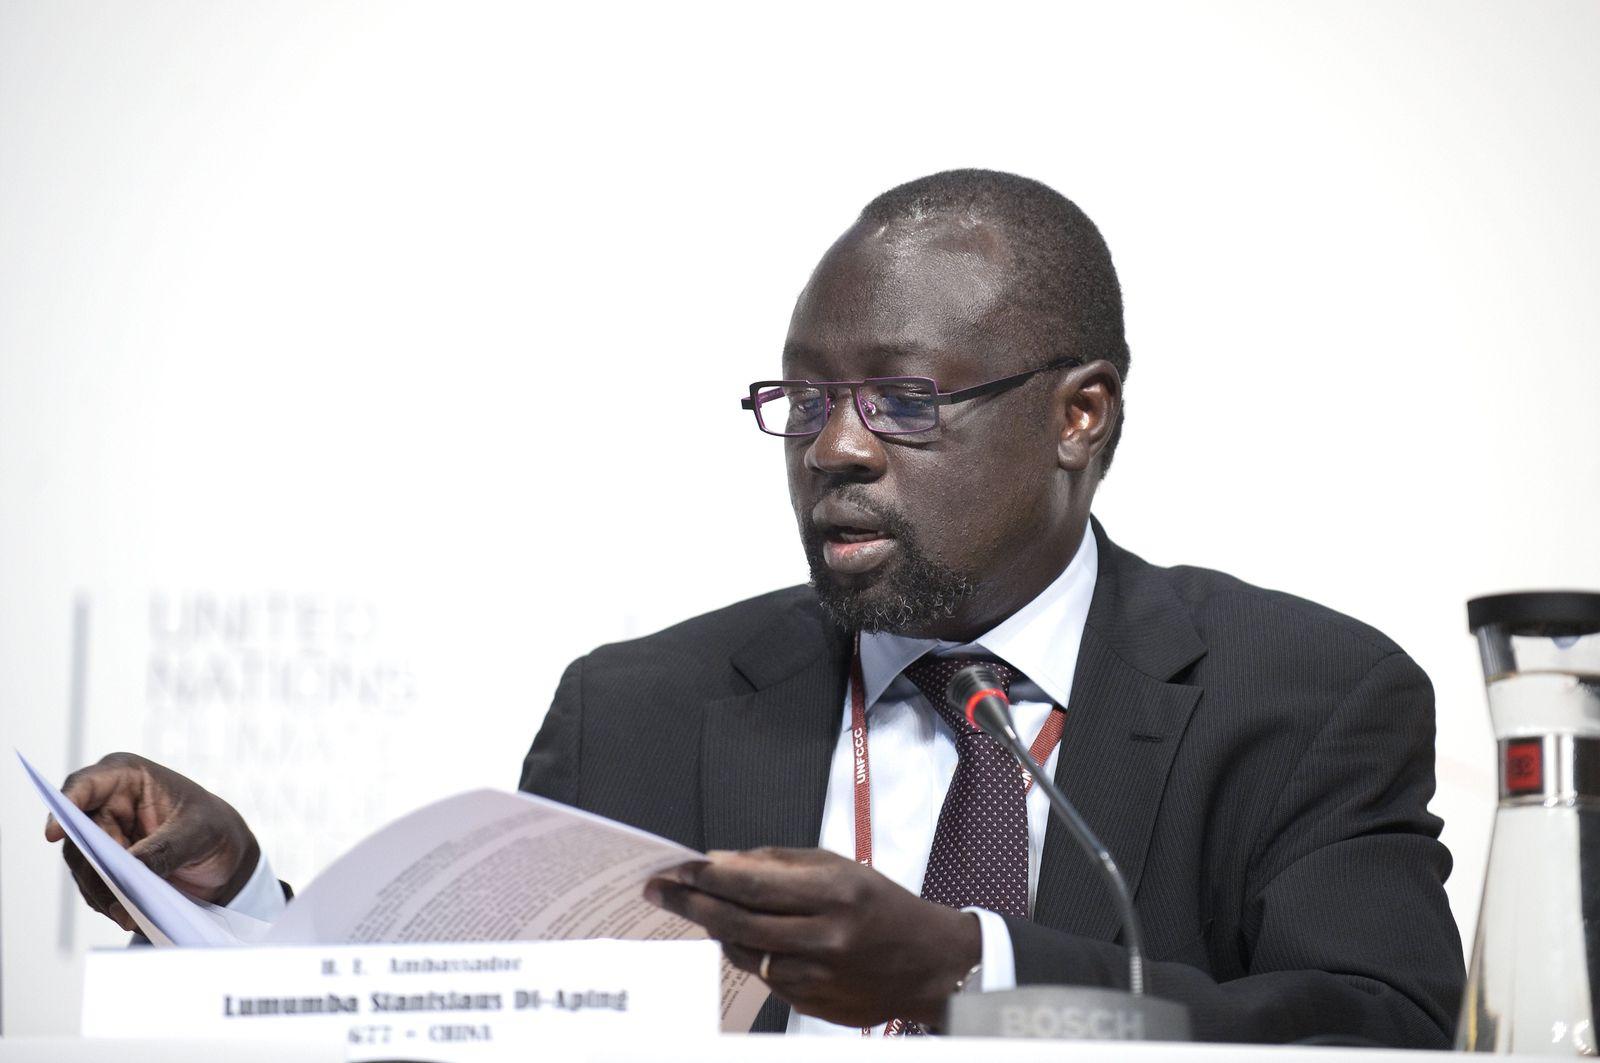 Lumumba Stanislaus DI-Aping